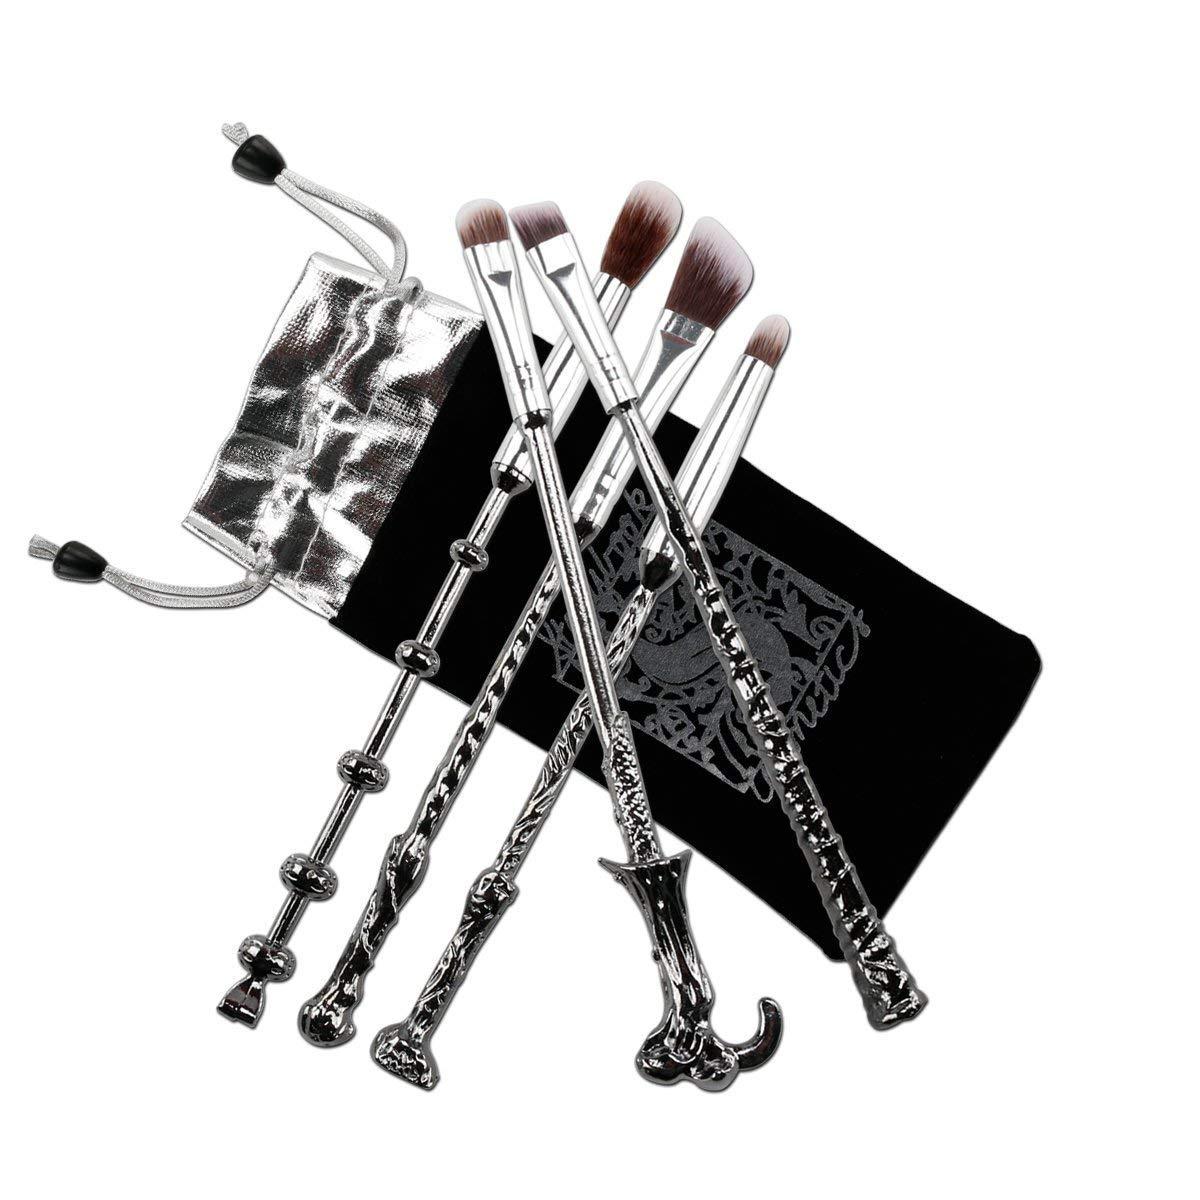 5 Pcs pinceles cepillos maquillaje cosmética Magic Harry Potter Collection regalo (Plateado)